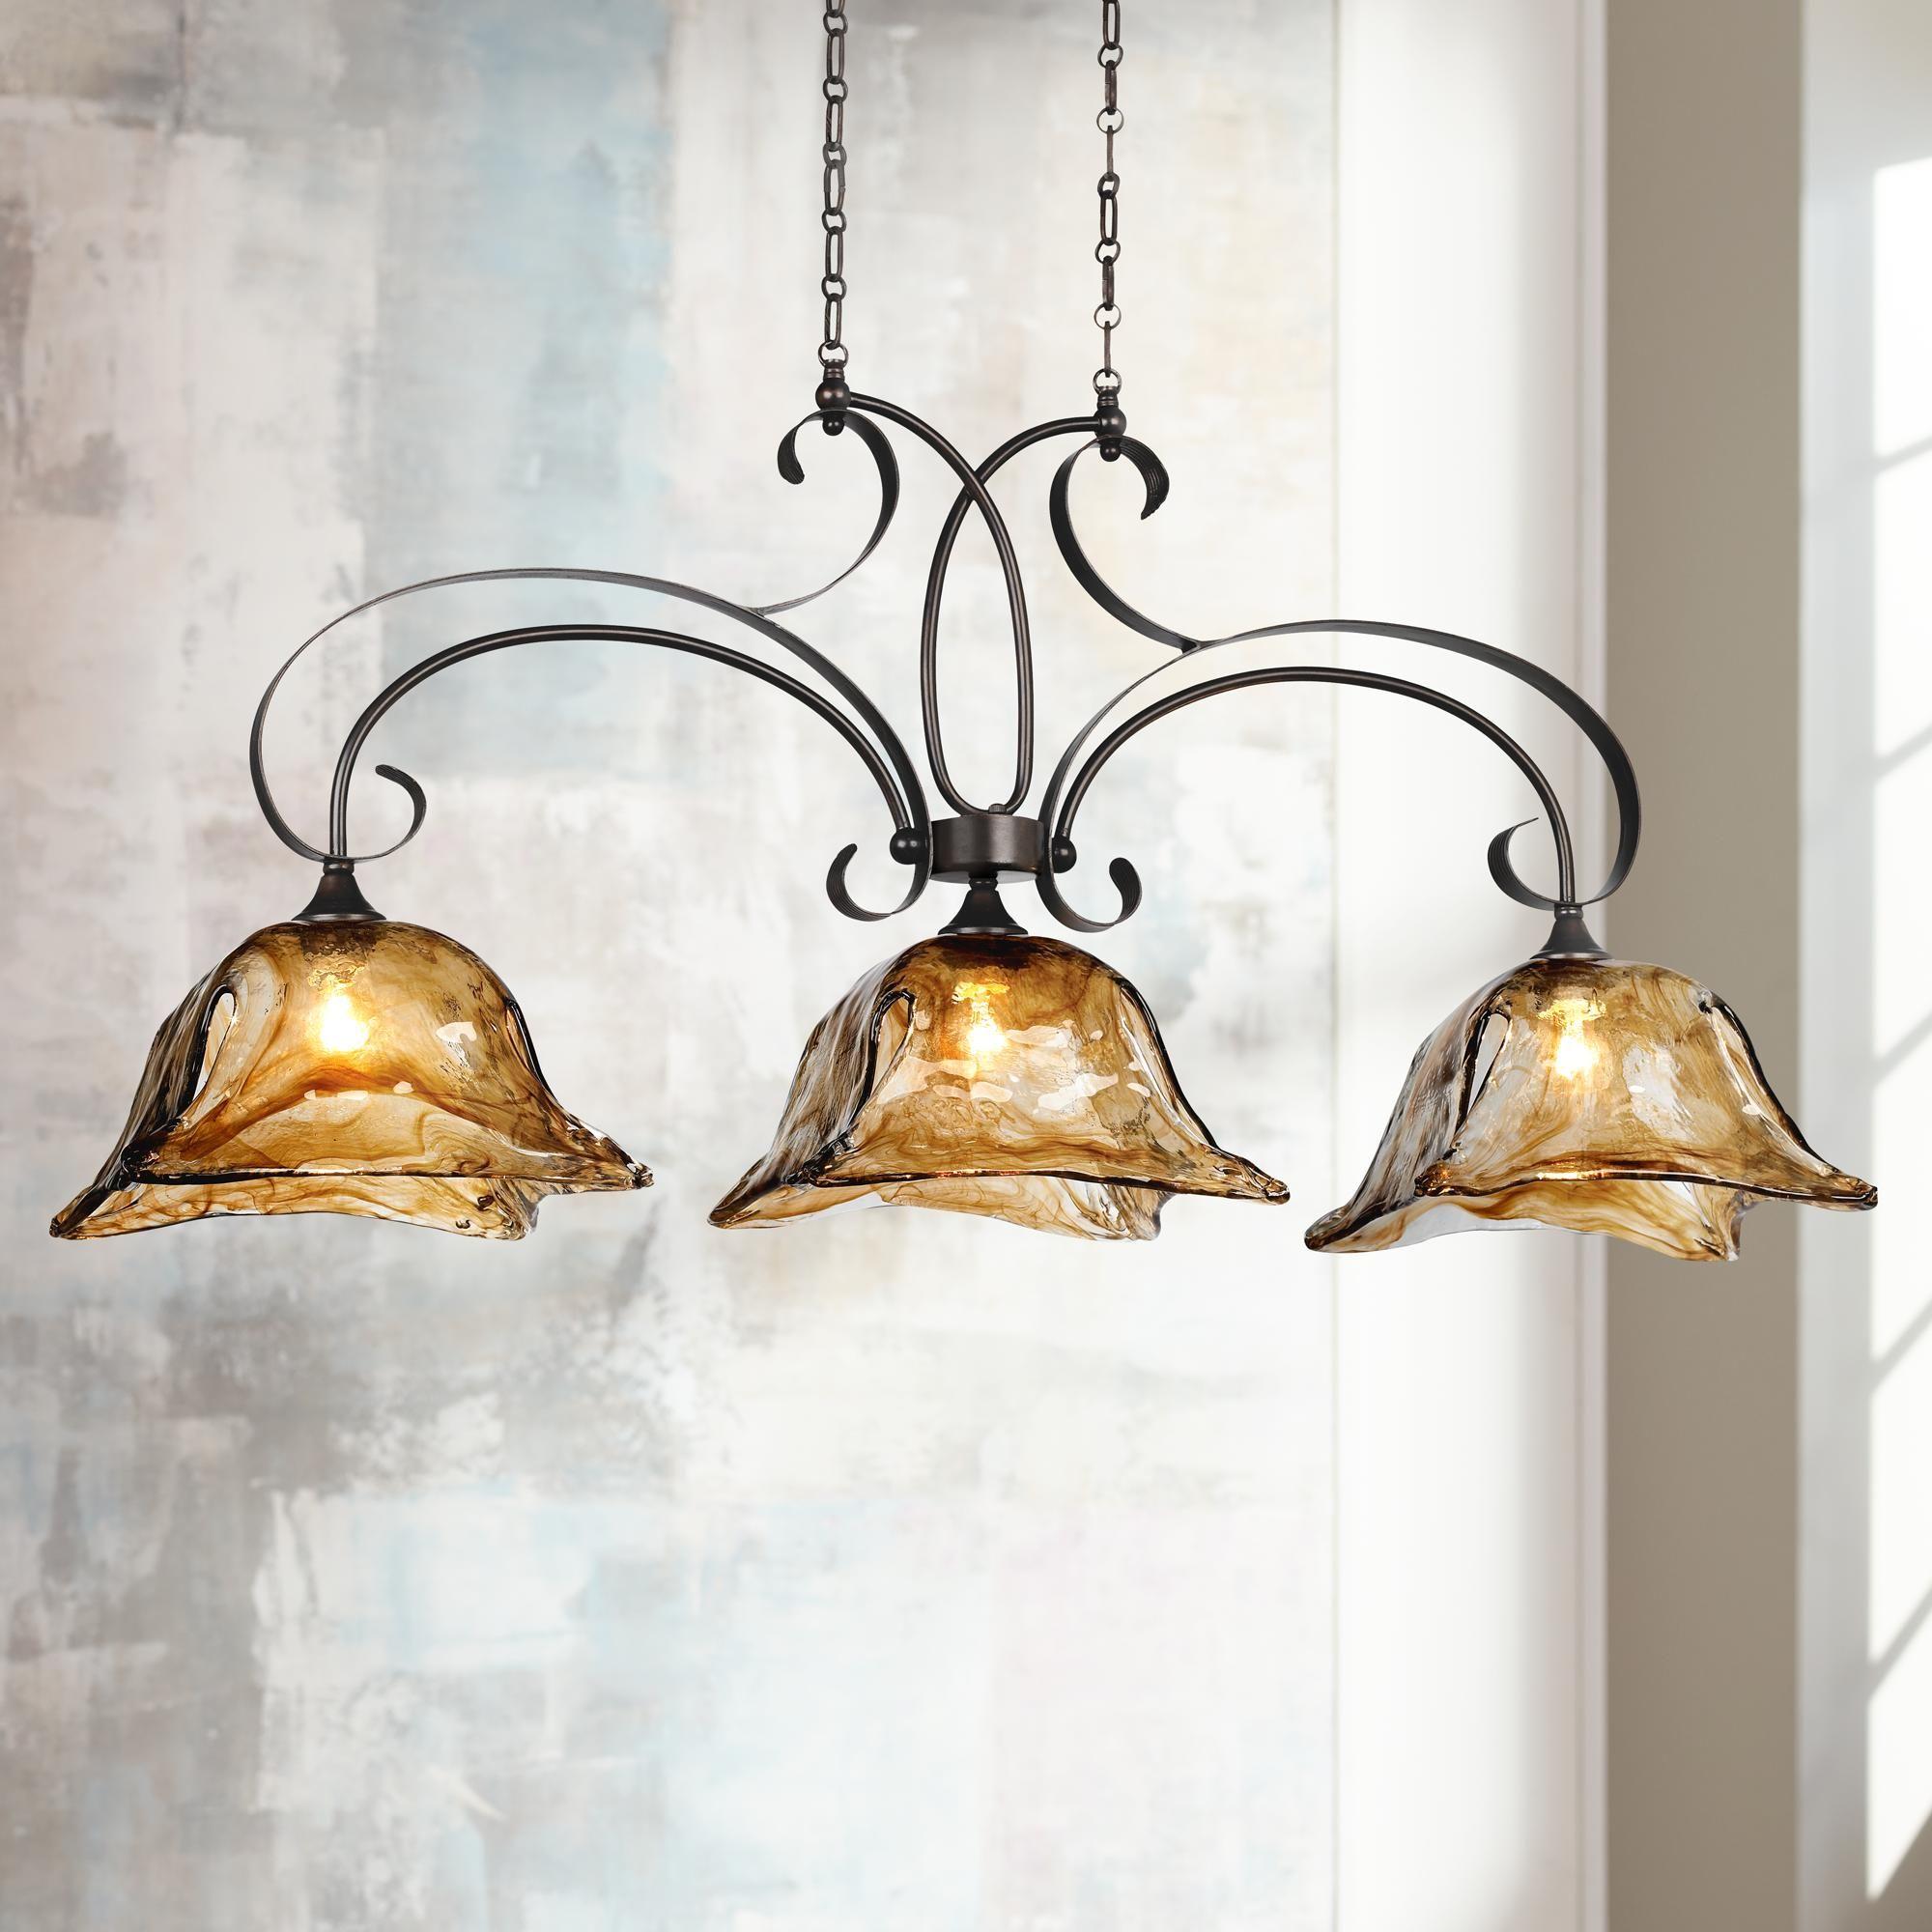 Vetraio 47 W Oiled Bronze Kitchen Island Light Chandelier 18226 Lamps Plus Kitchen Island Lighting Rustic Chandelier Bronze Kitchen